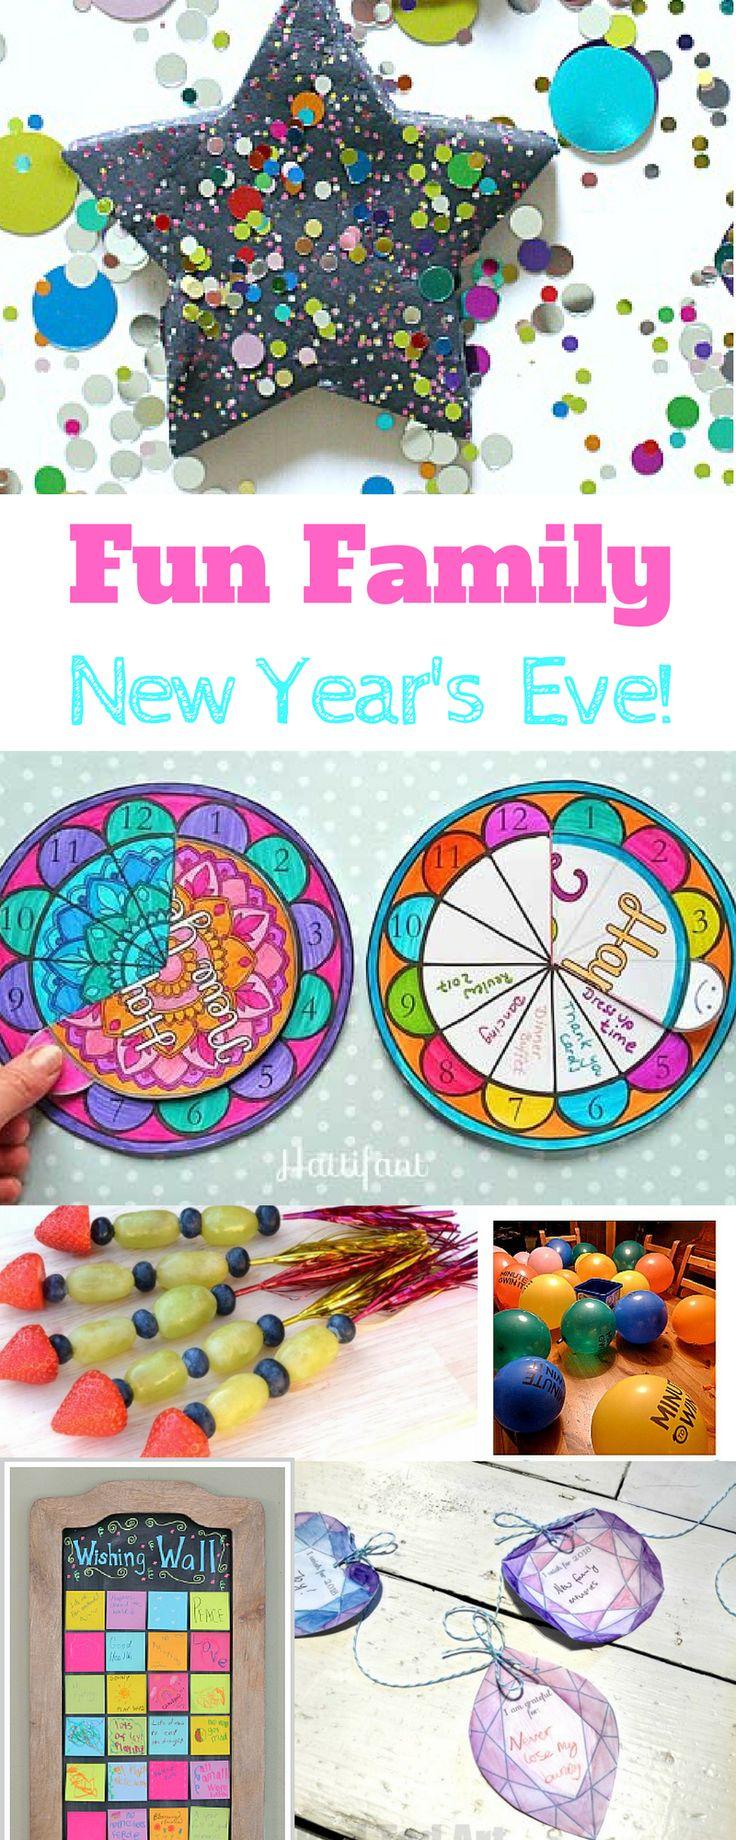 Fun _Family new years eve